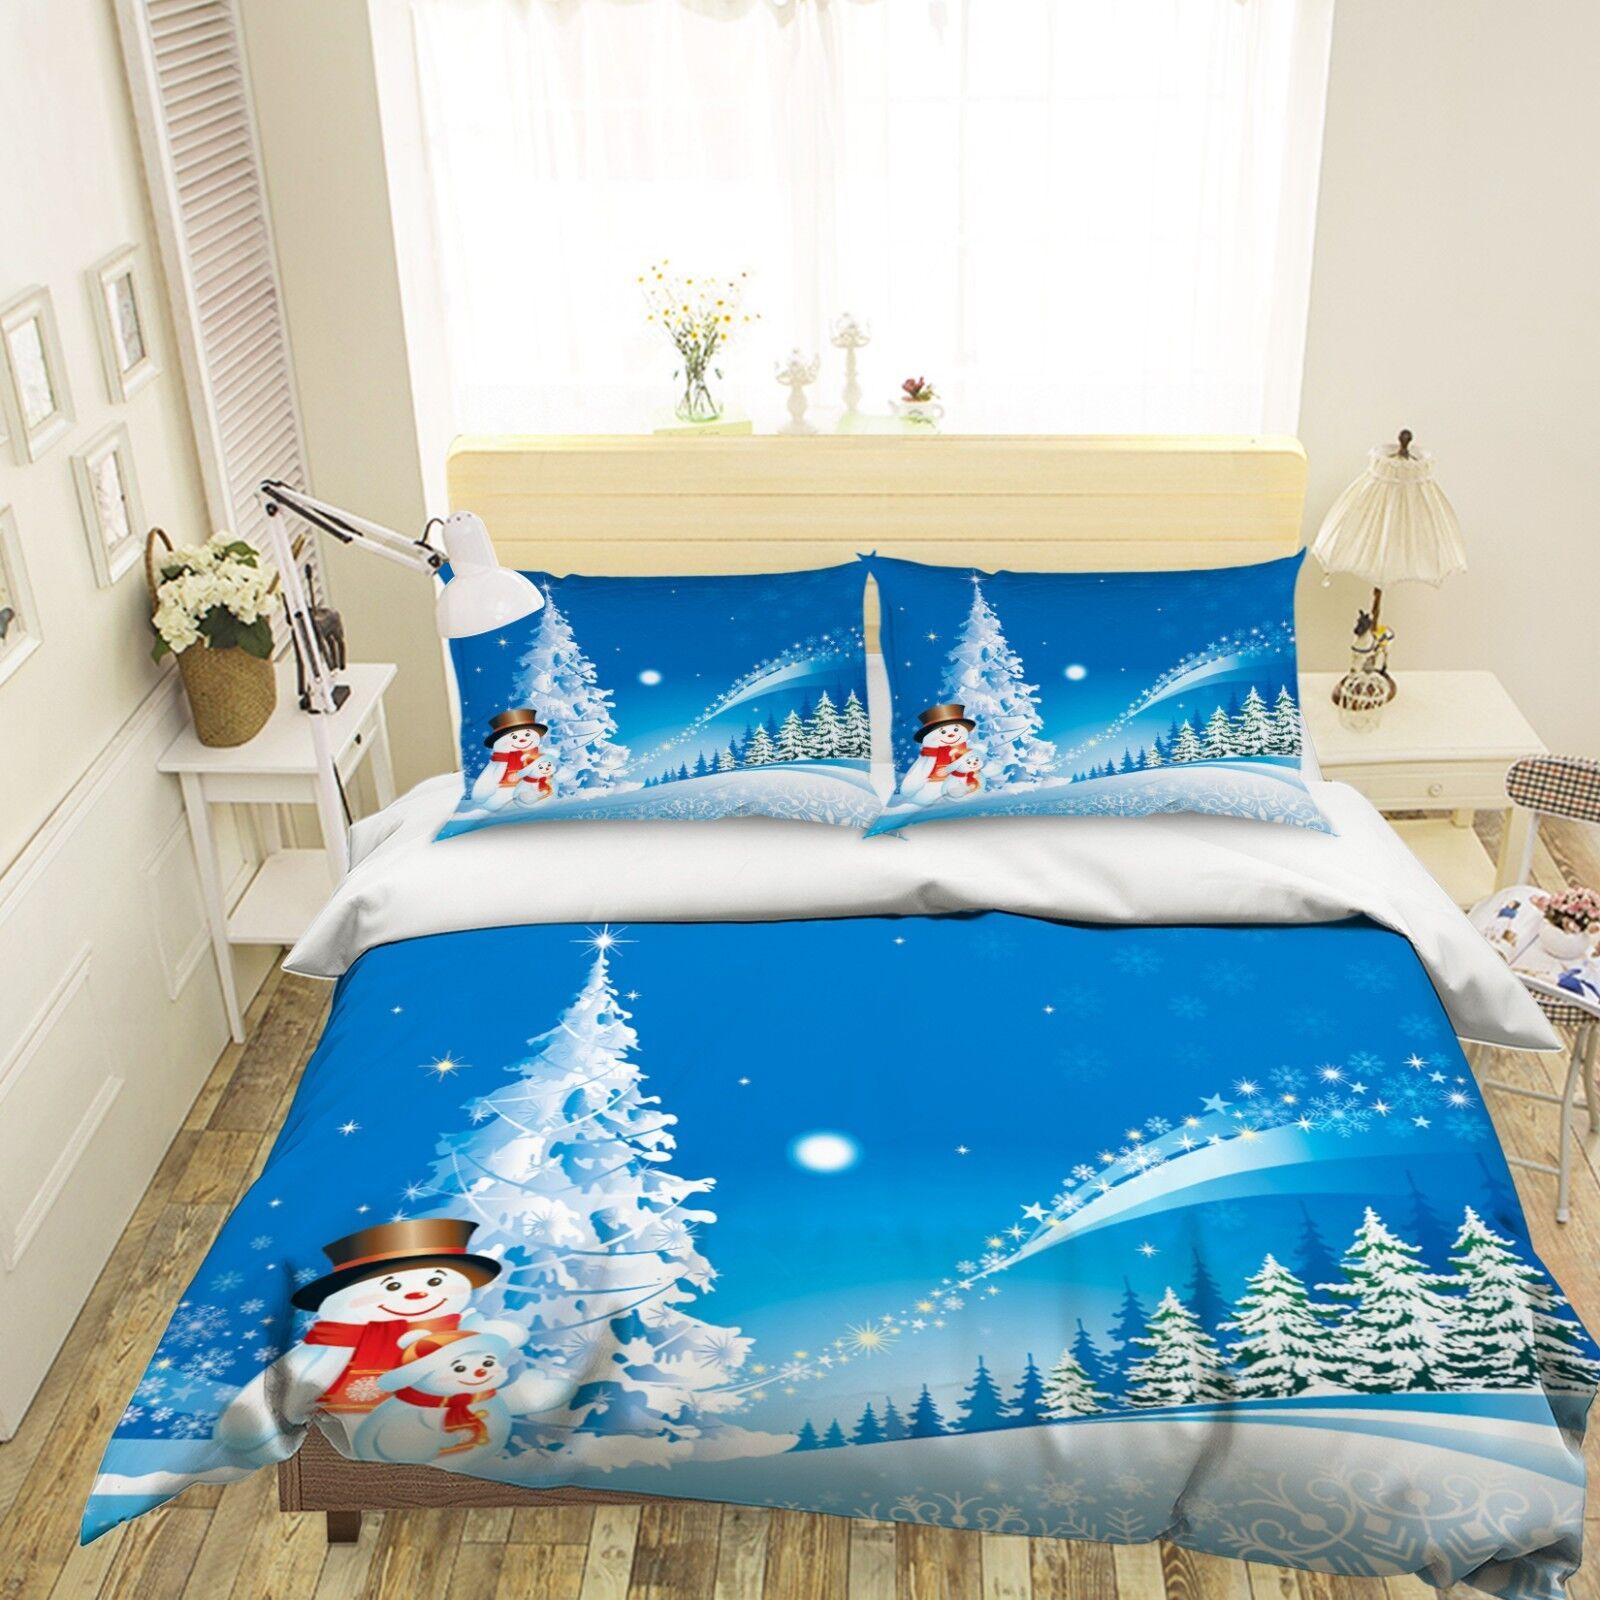 3D Christmas Xmas Weiß 48 Bed Pillowcases Quilt Duvet Cover Set Single King UK